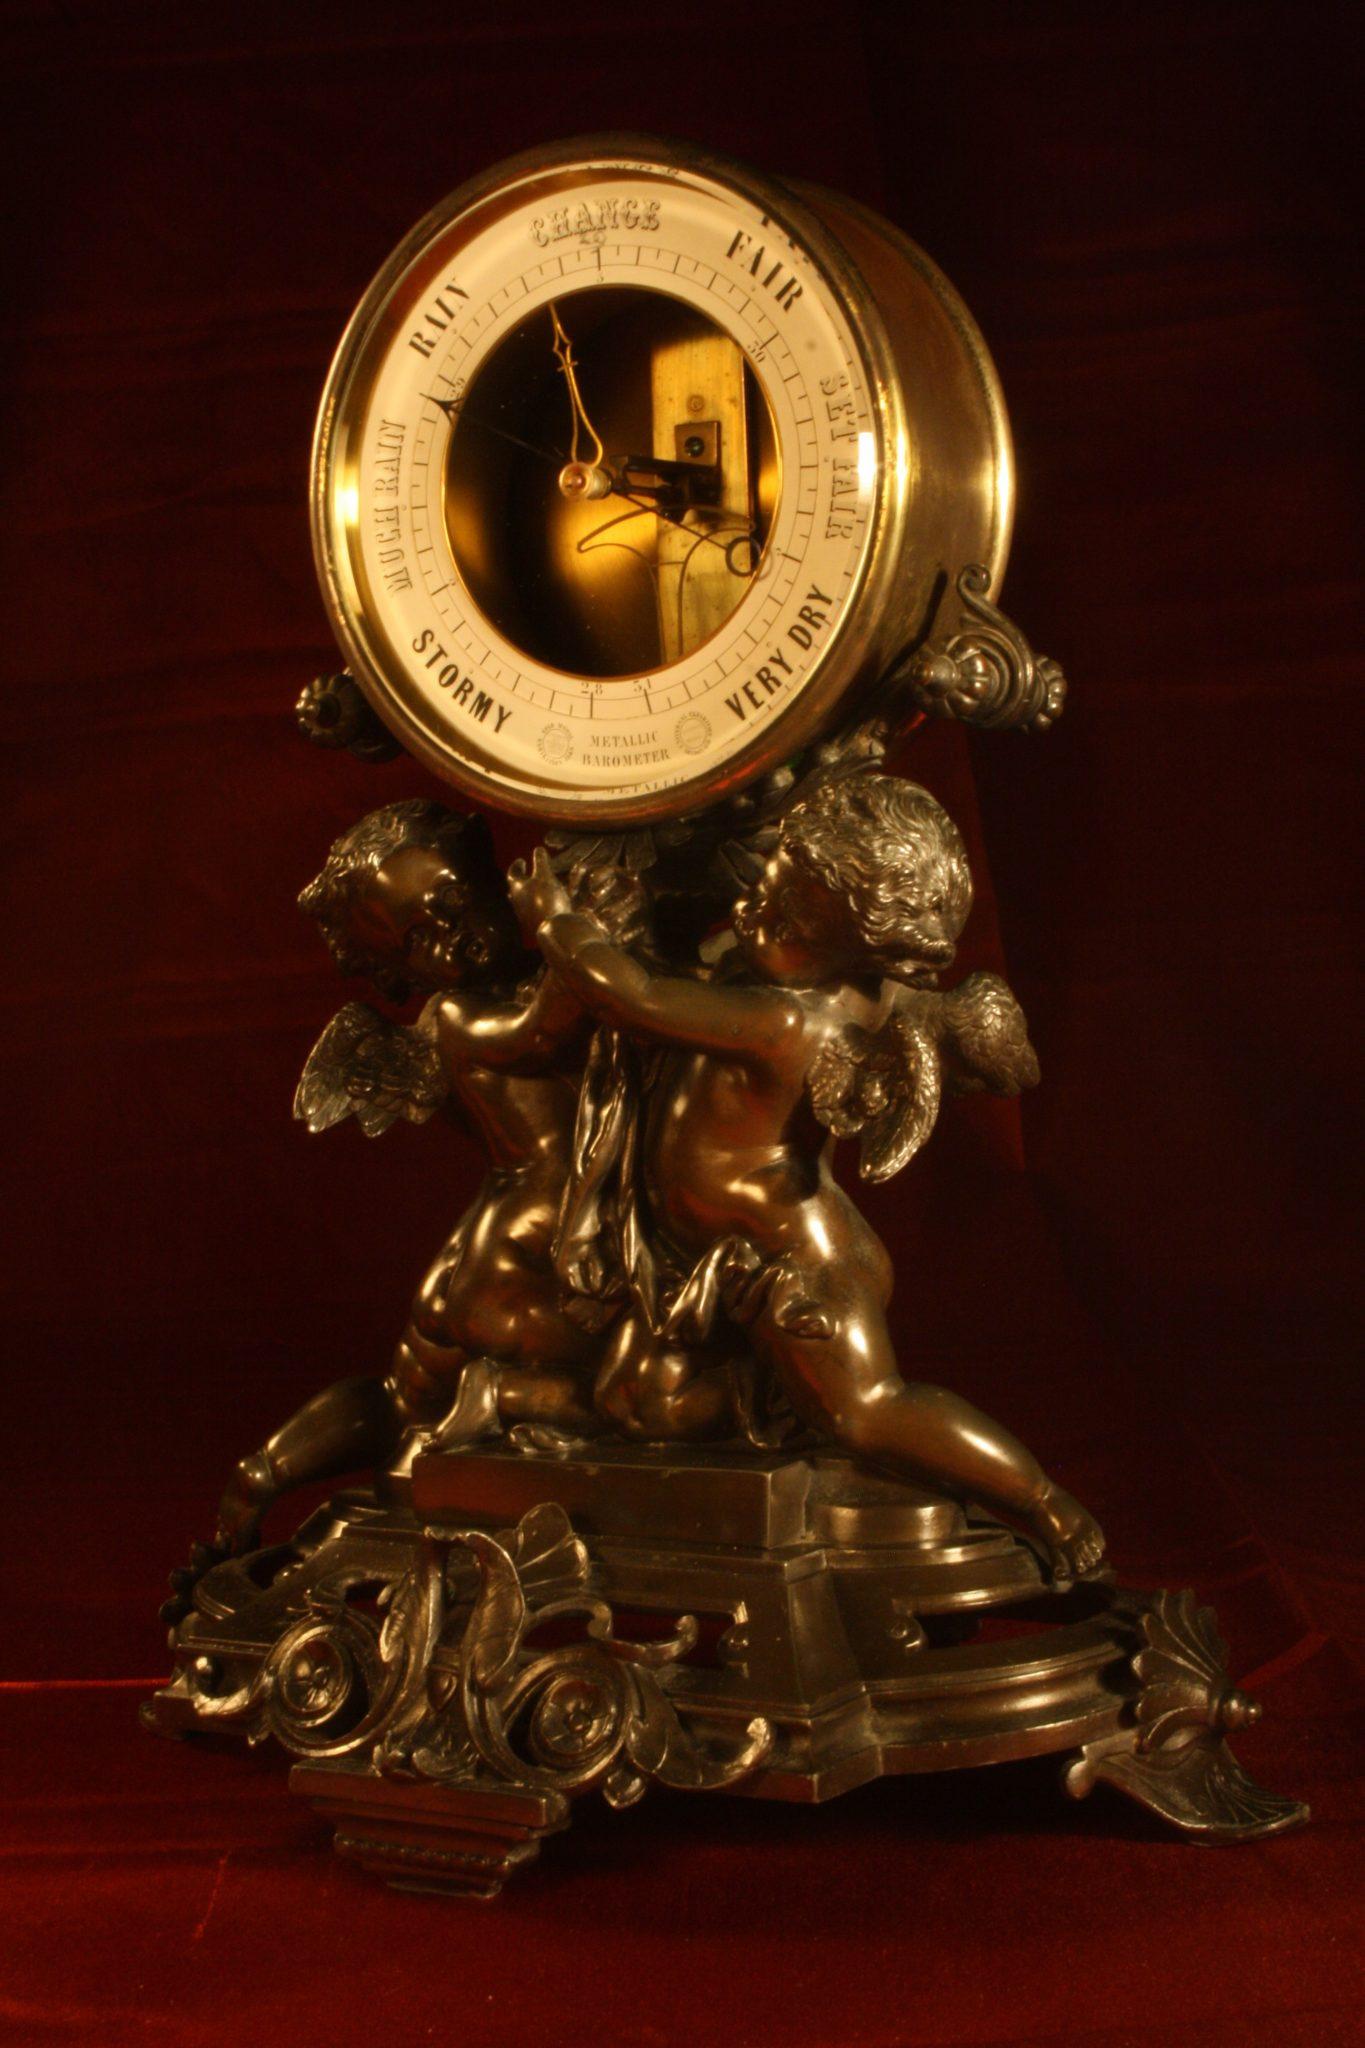 Image of Bourdon & Richard Barometer